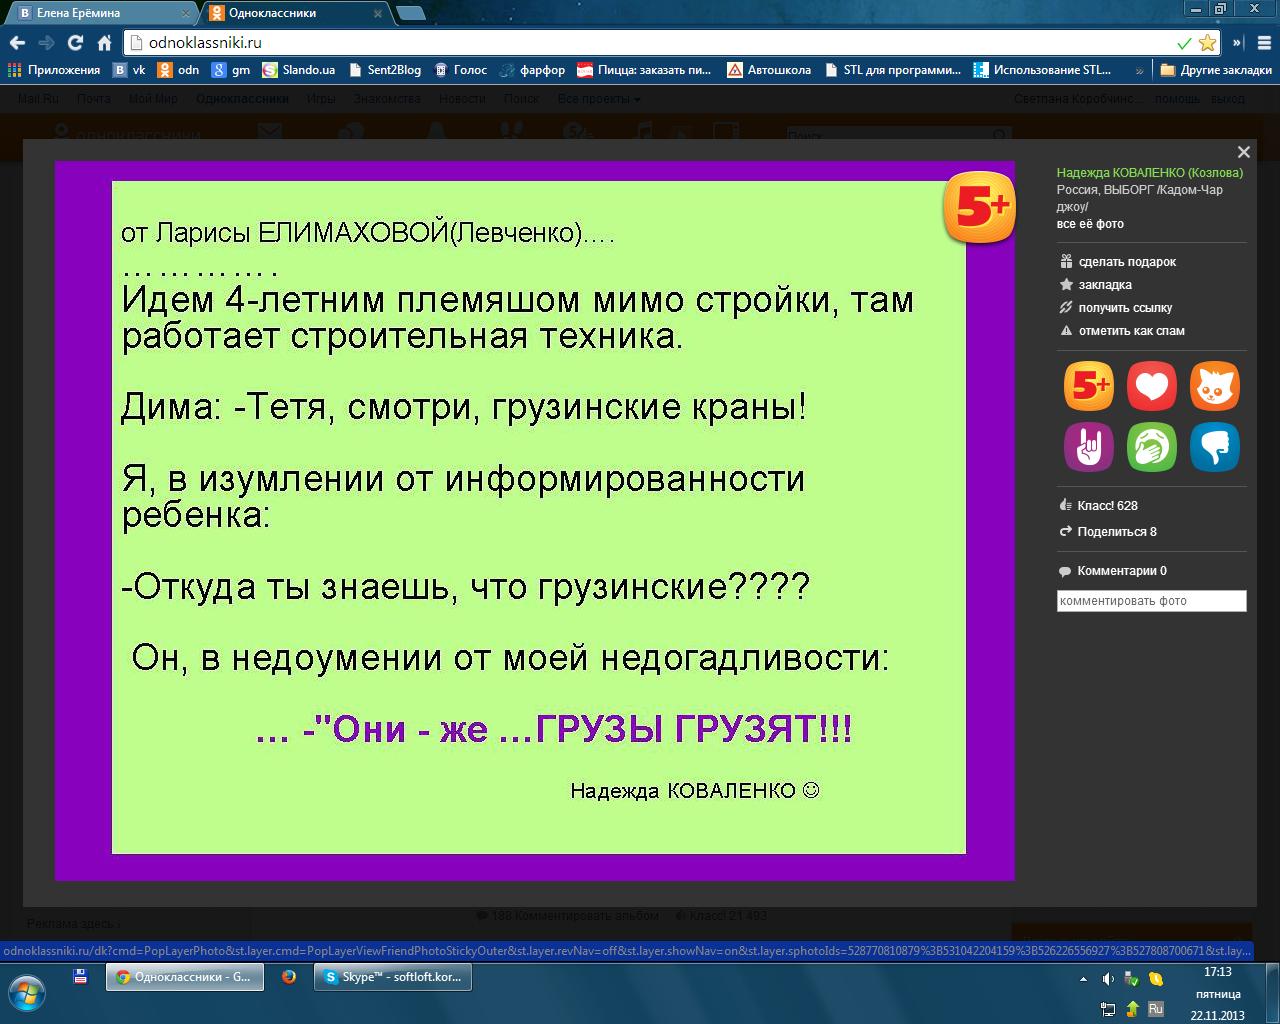 IMG_22112013_171323